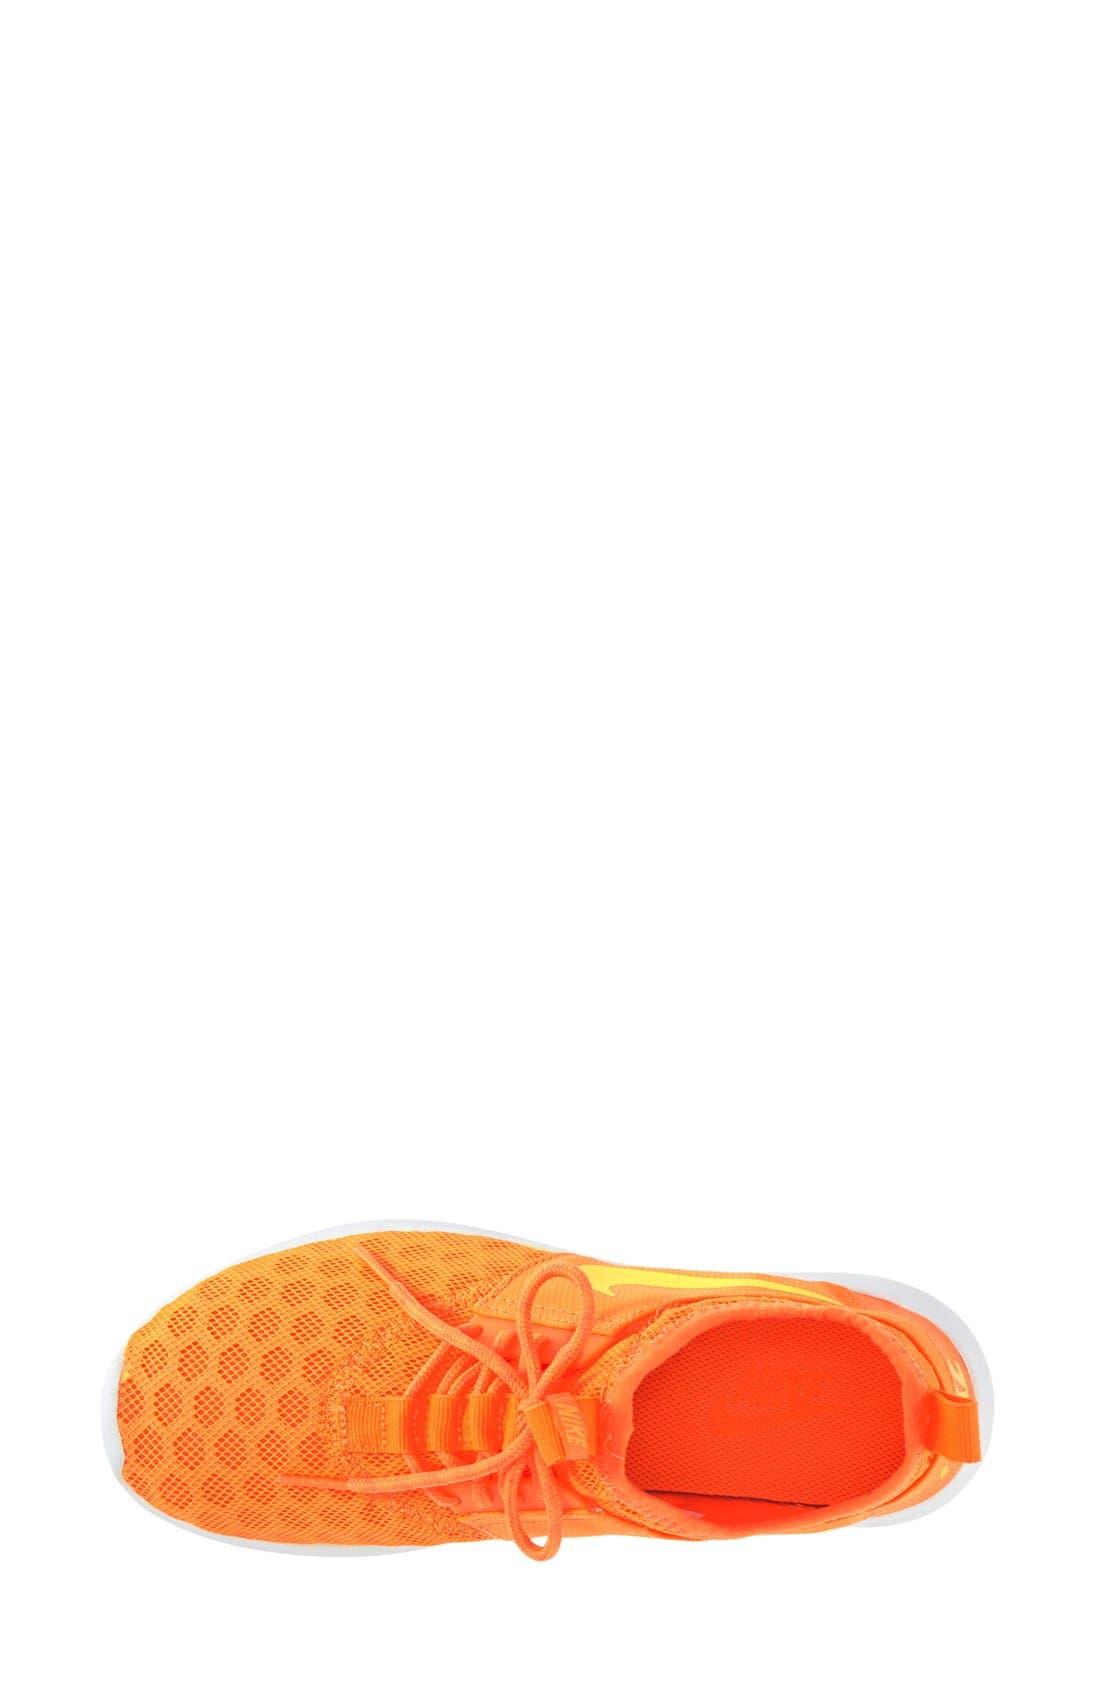 Juvenate Sneaker,                             Alternate thumbnail 160, color,